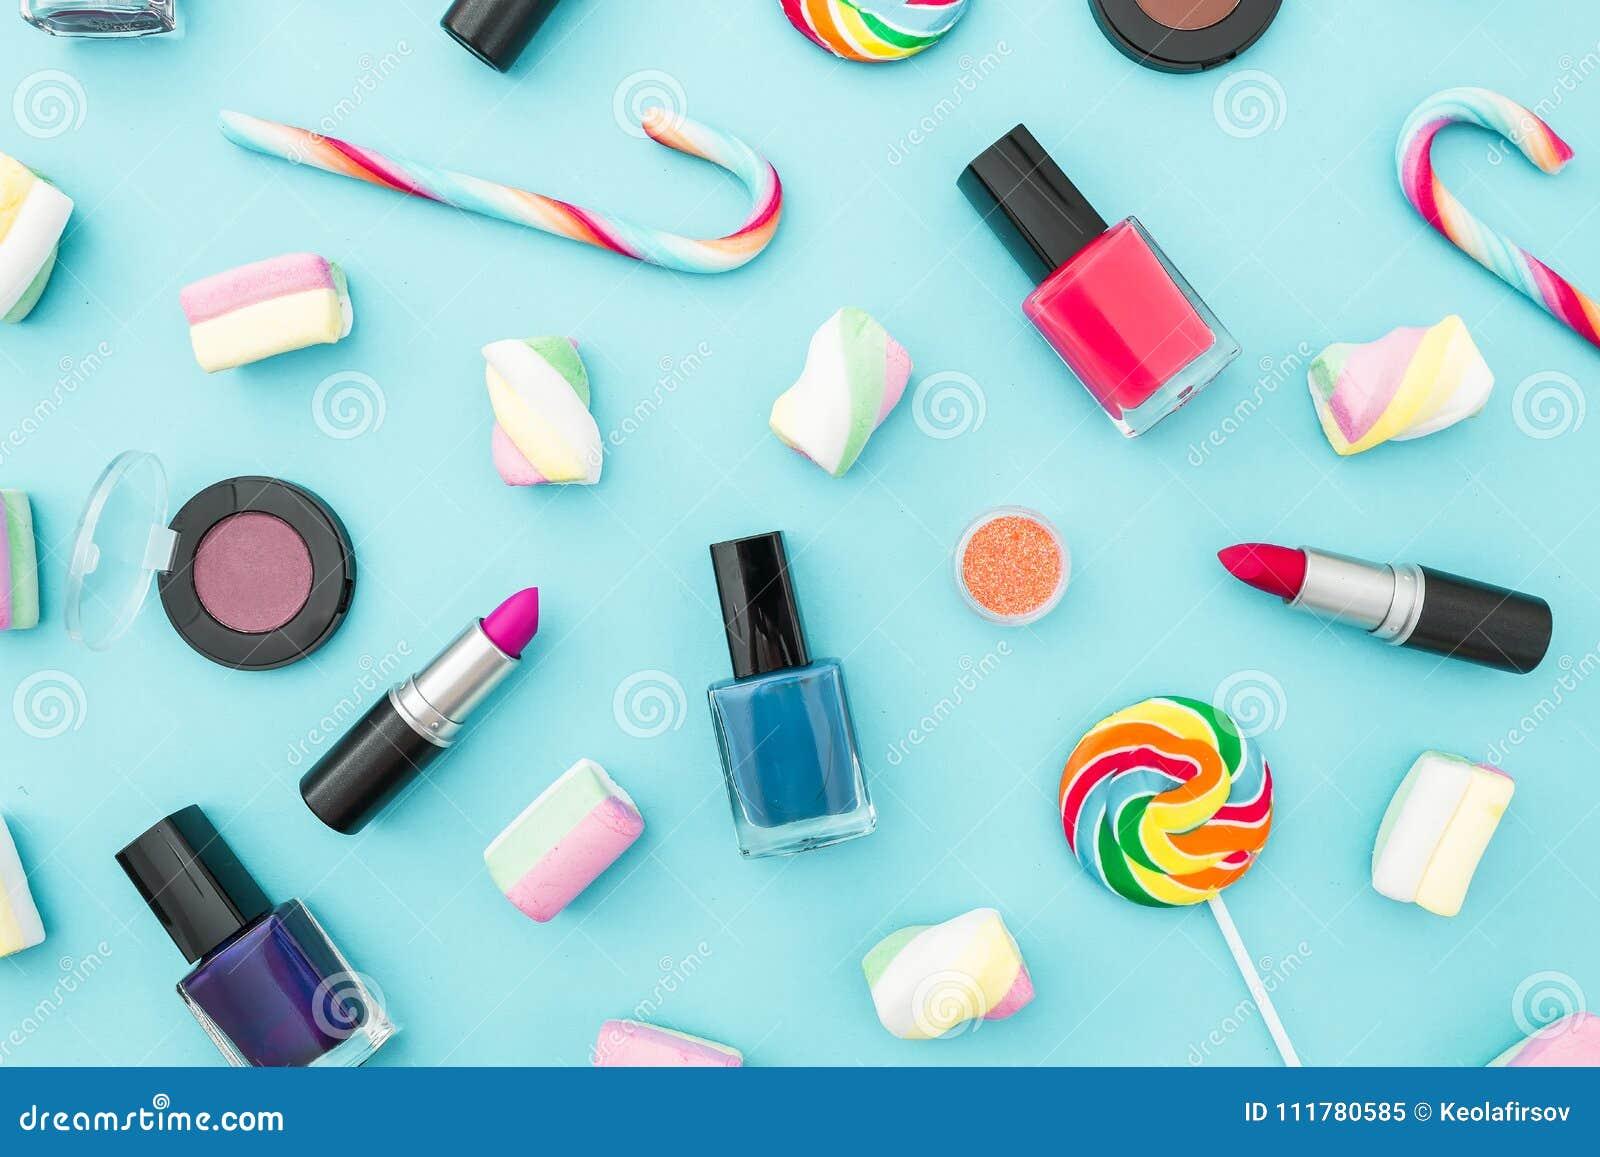 Feminine cosmetics and bright sugar candy on blue pastel background. Top view. Flat lay. Creativity feminine desk.